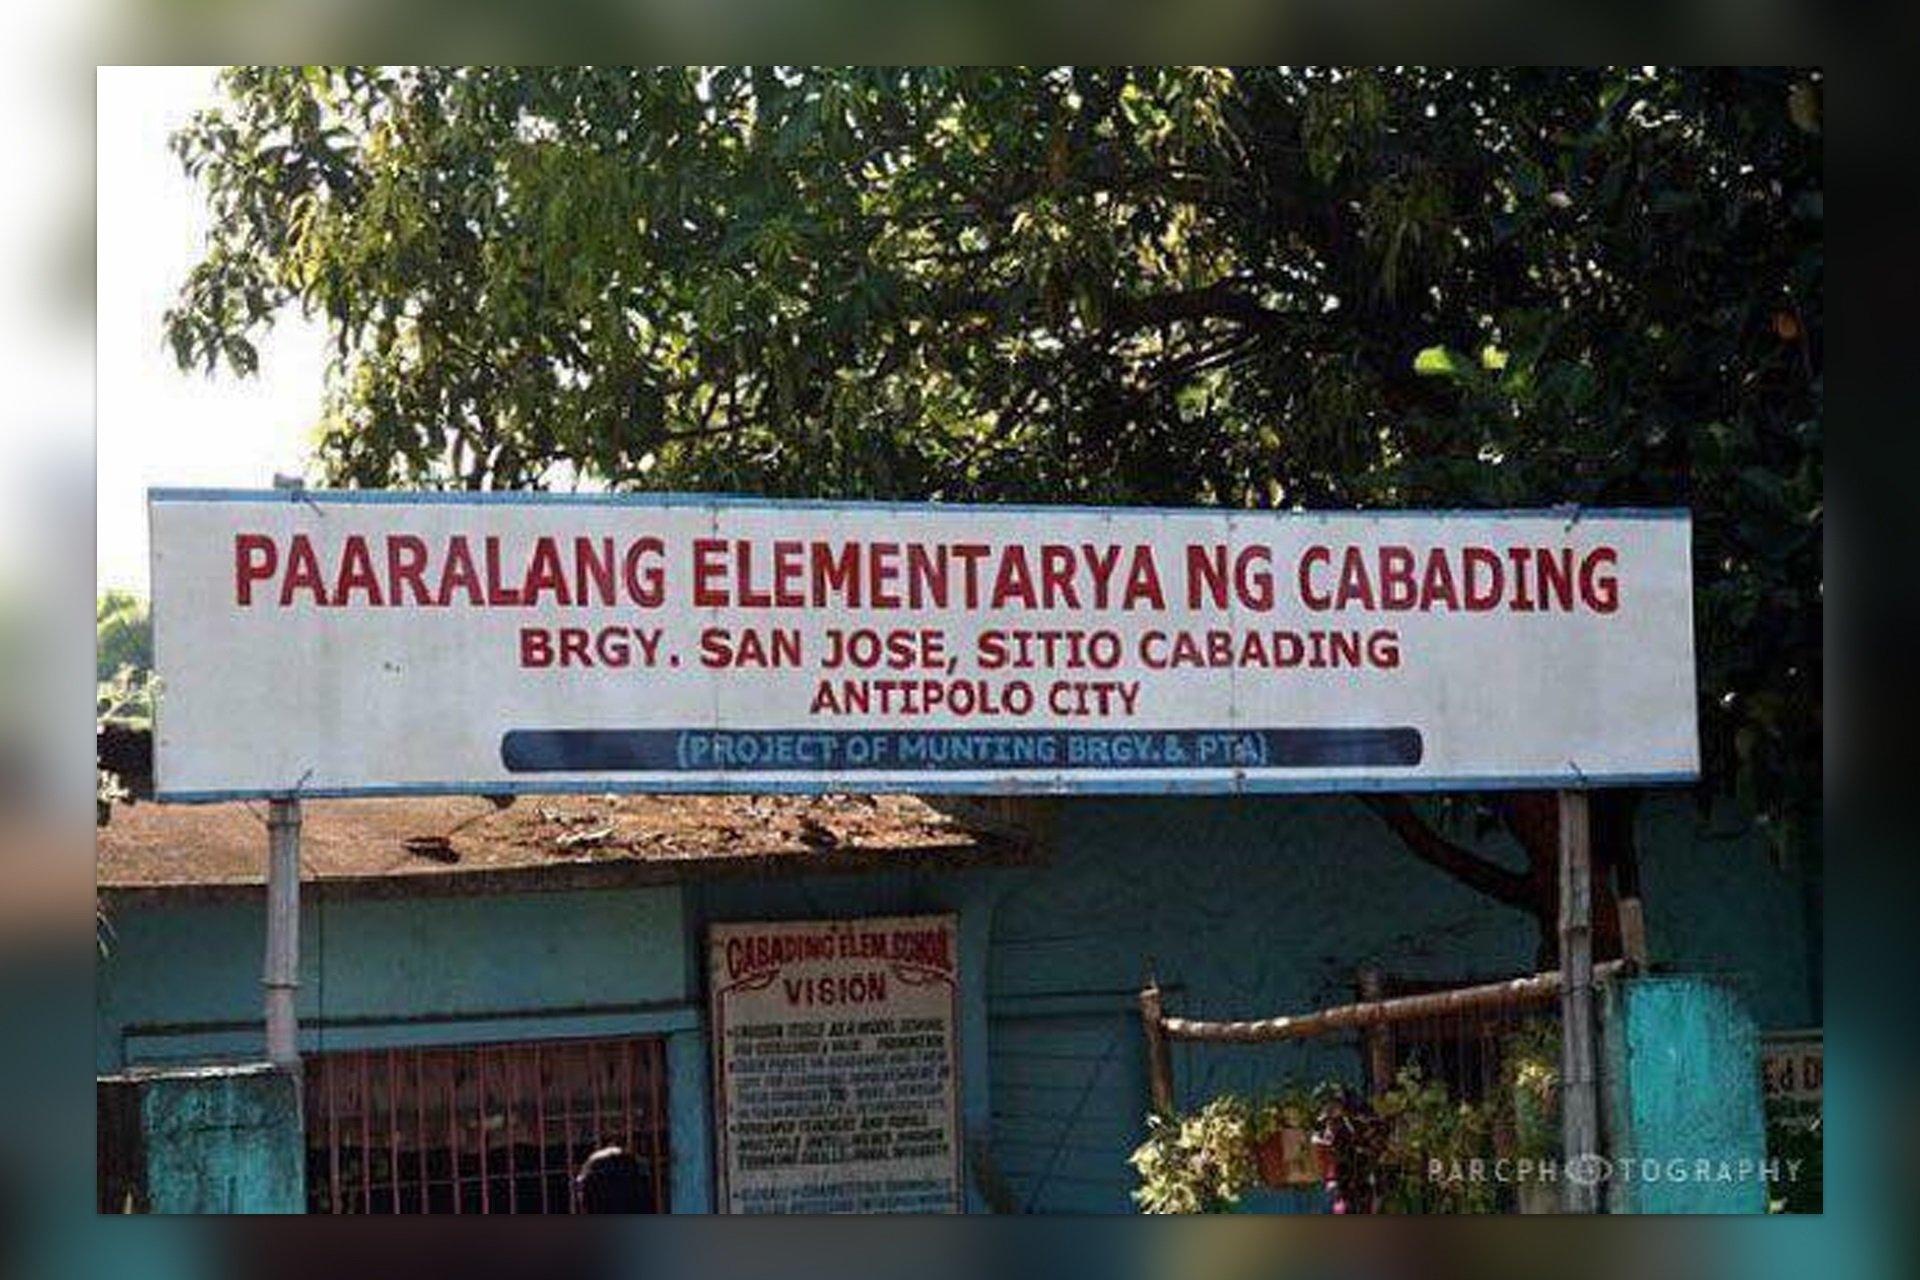 Cabading Elementary School